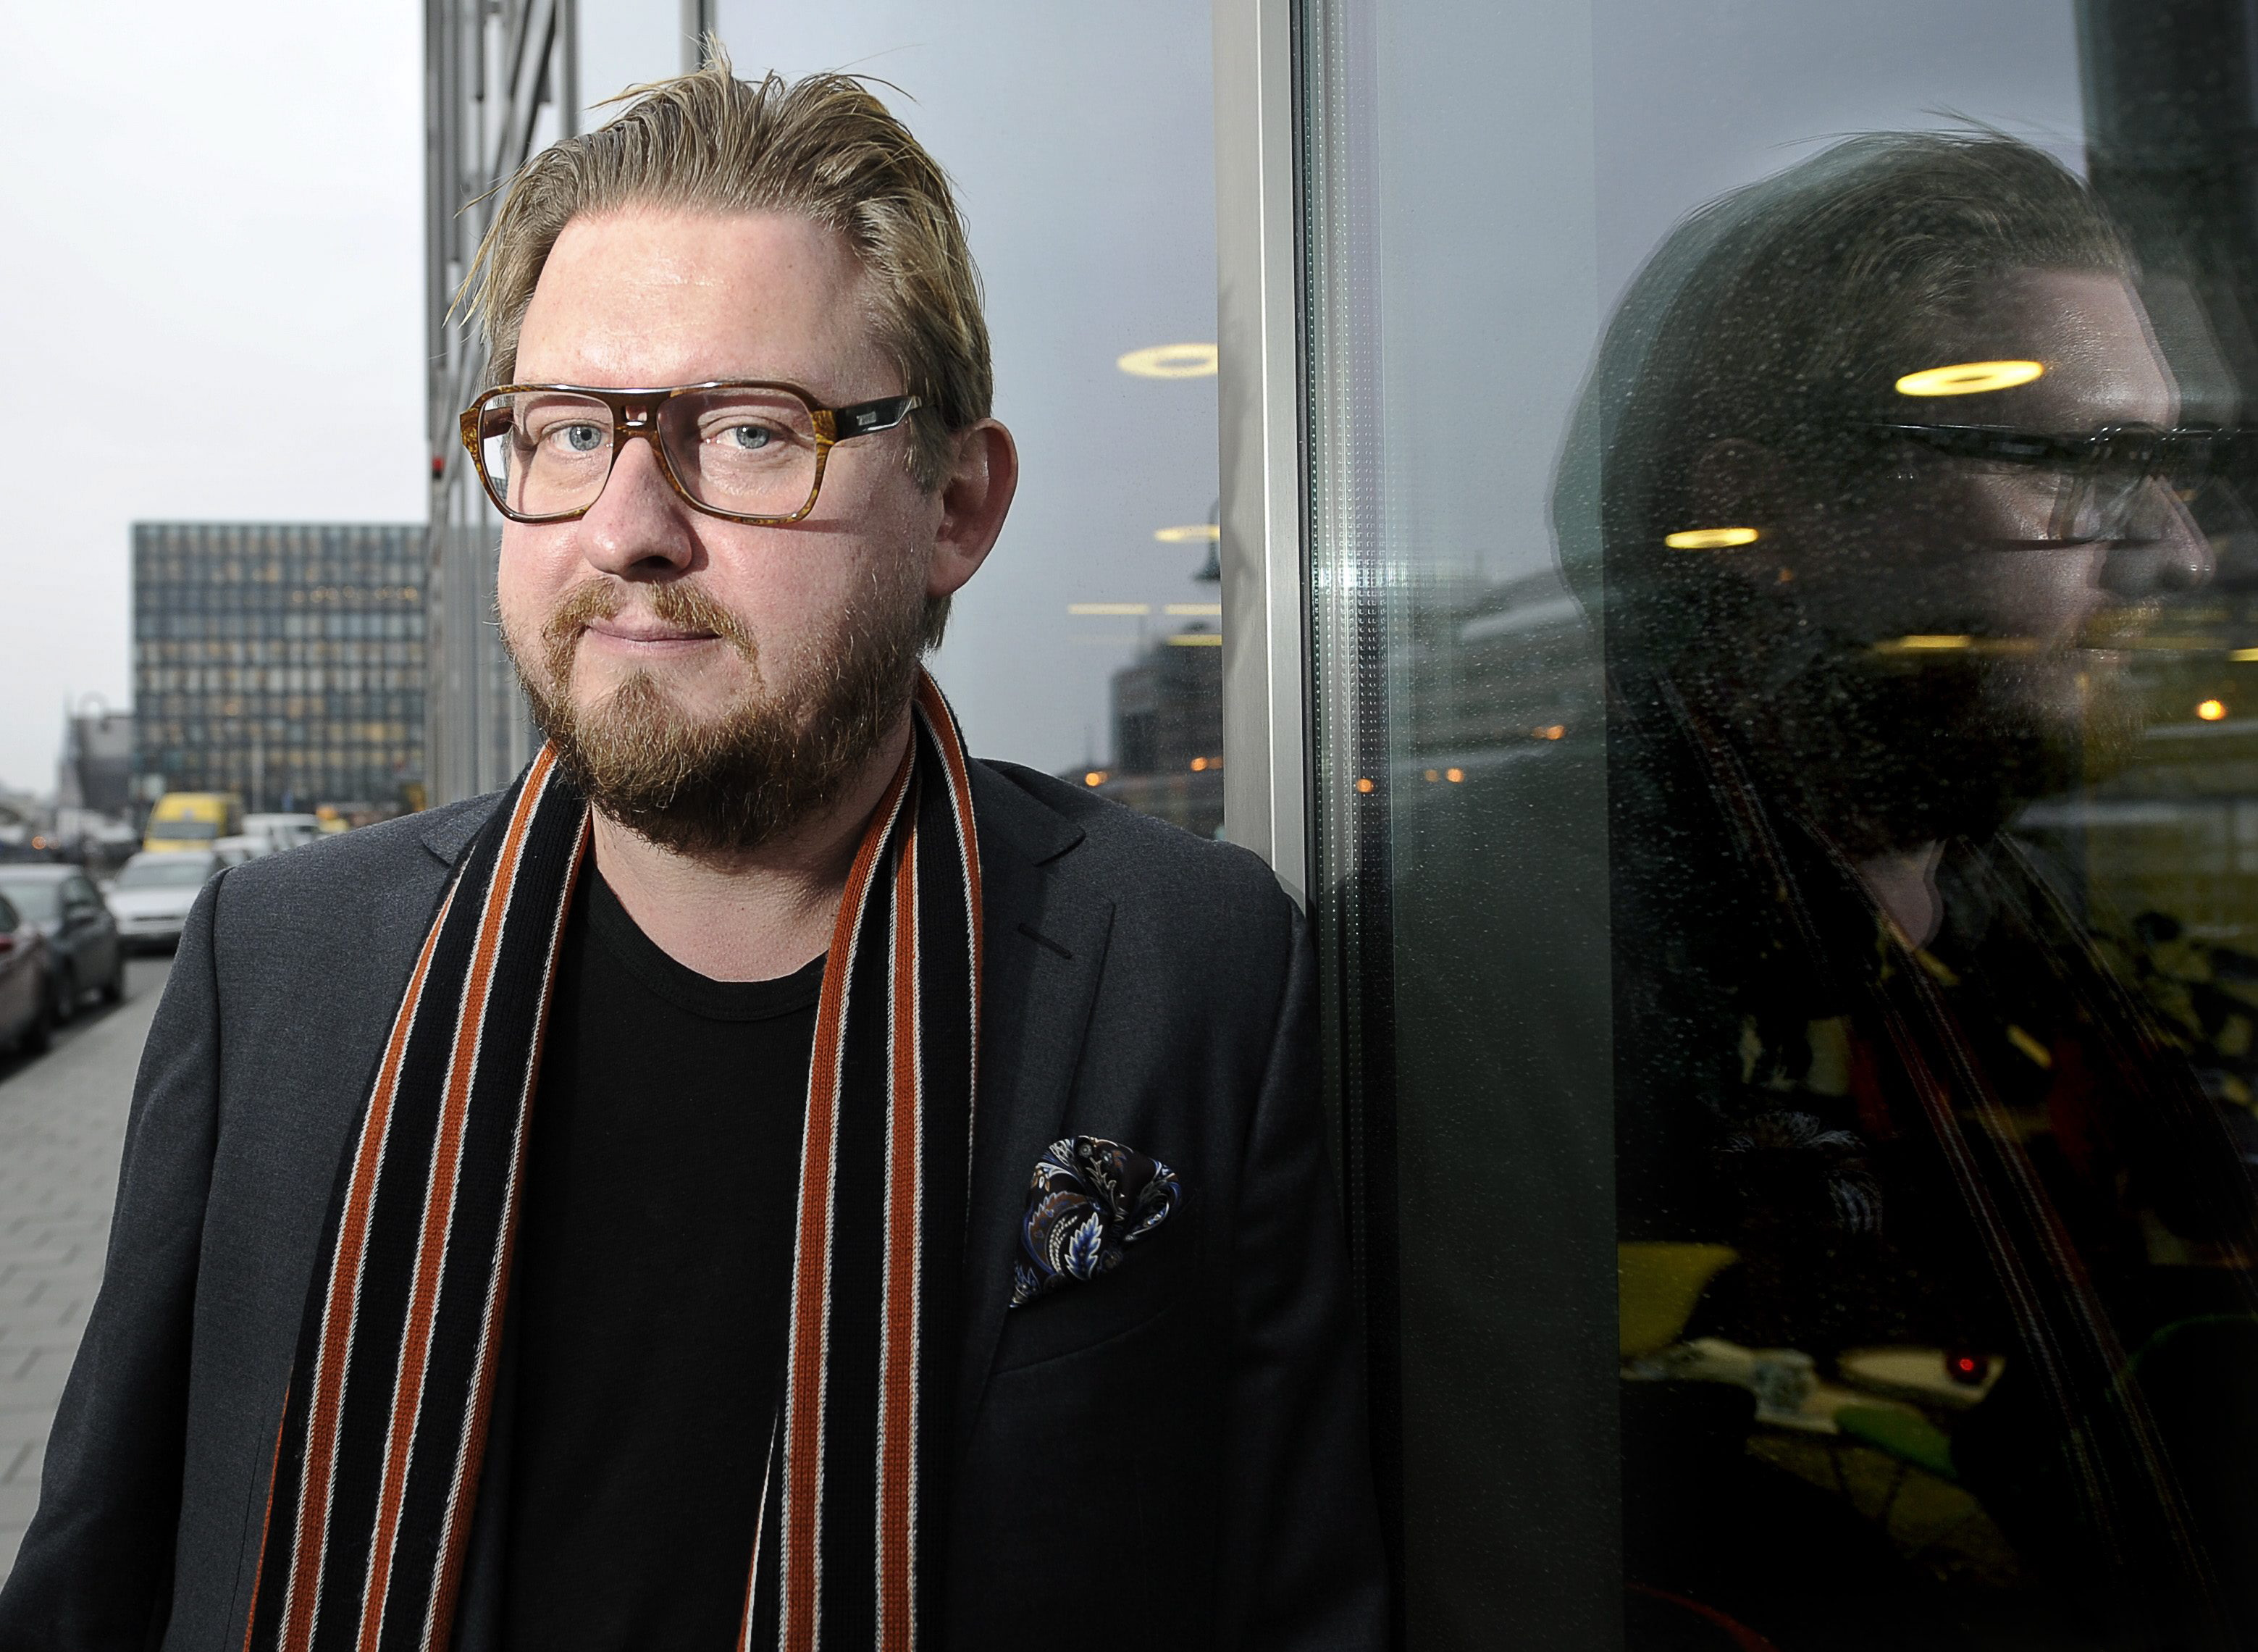 STOCKHOLM 2011102 Aftonbladsjournalisten Fredrik Virtanen fyller 40 år i november Foto: Anders Wiklund / SCANPIX / Kod 10040